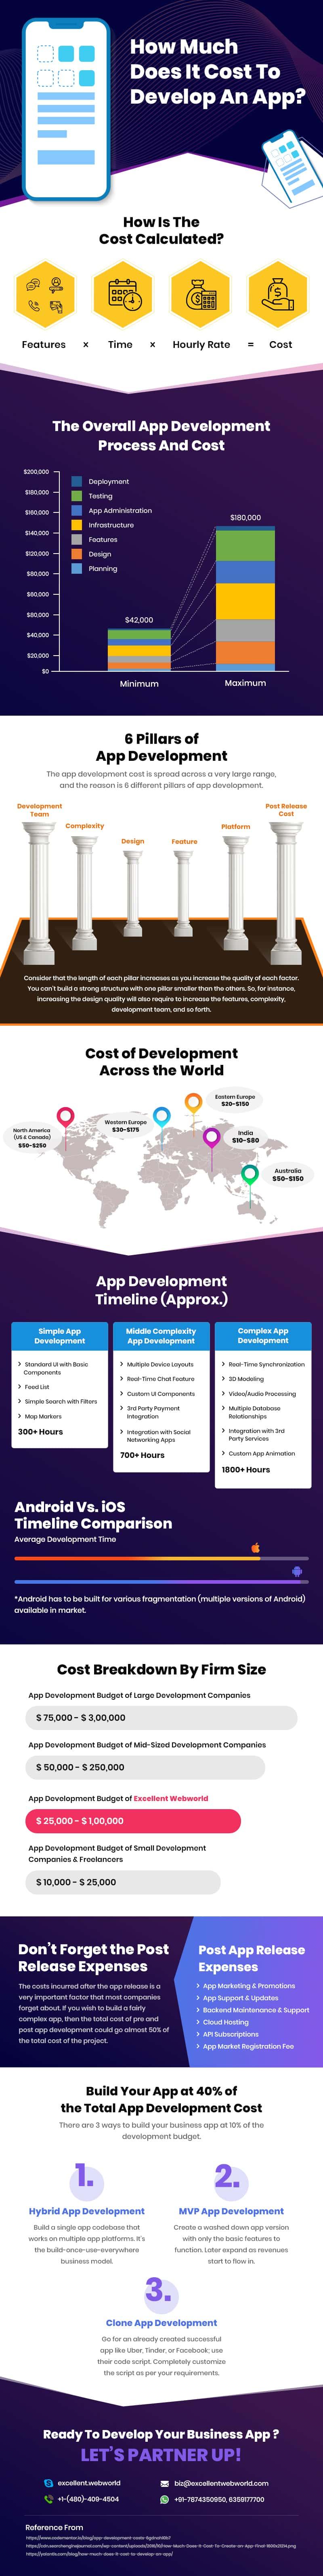 App Development Cost Infographic